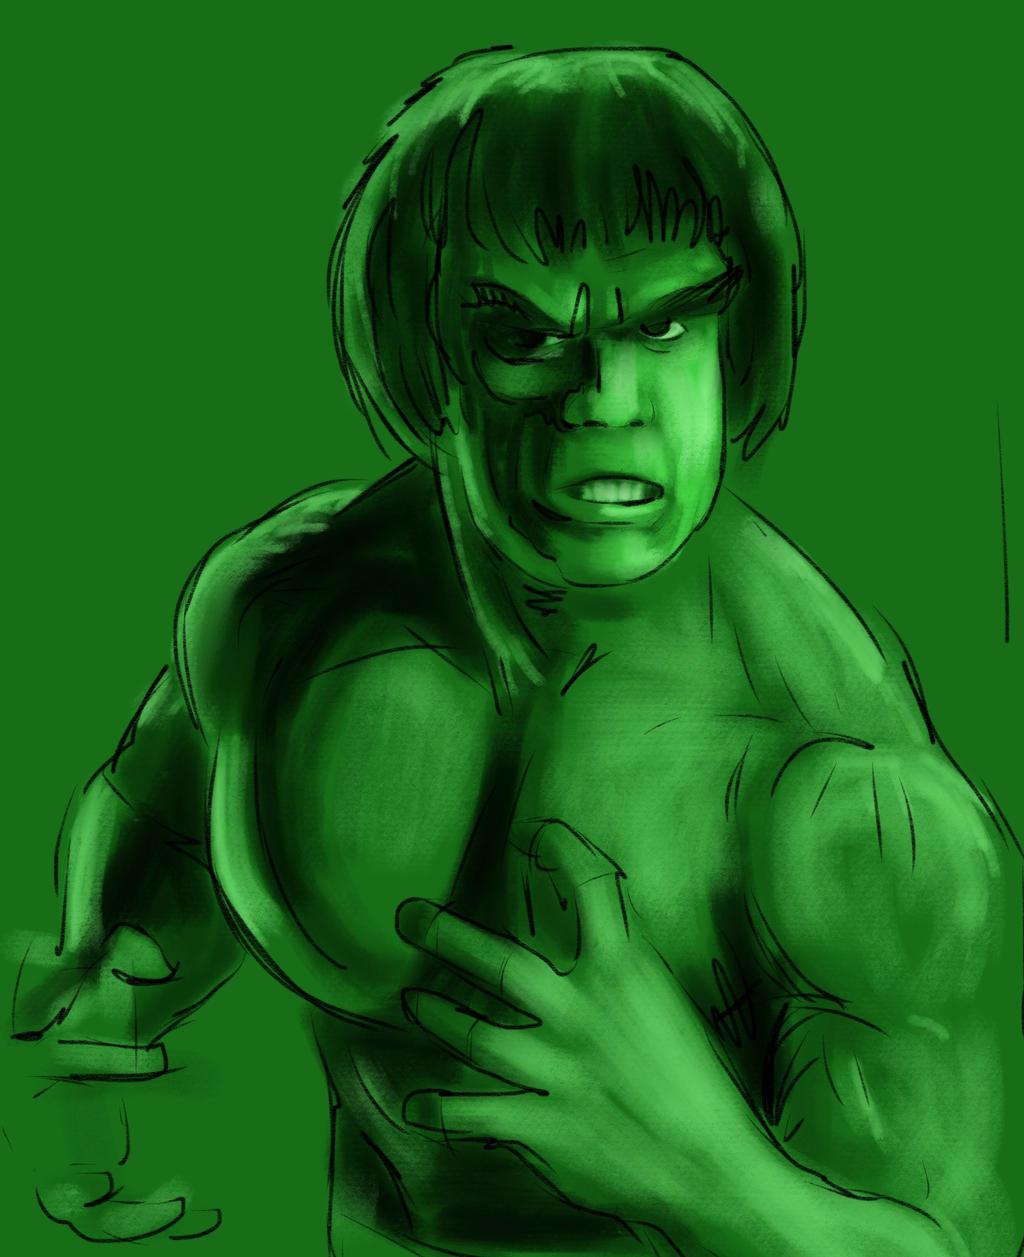 TV Hulk by JeremyWDunn